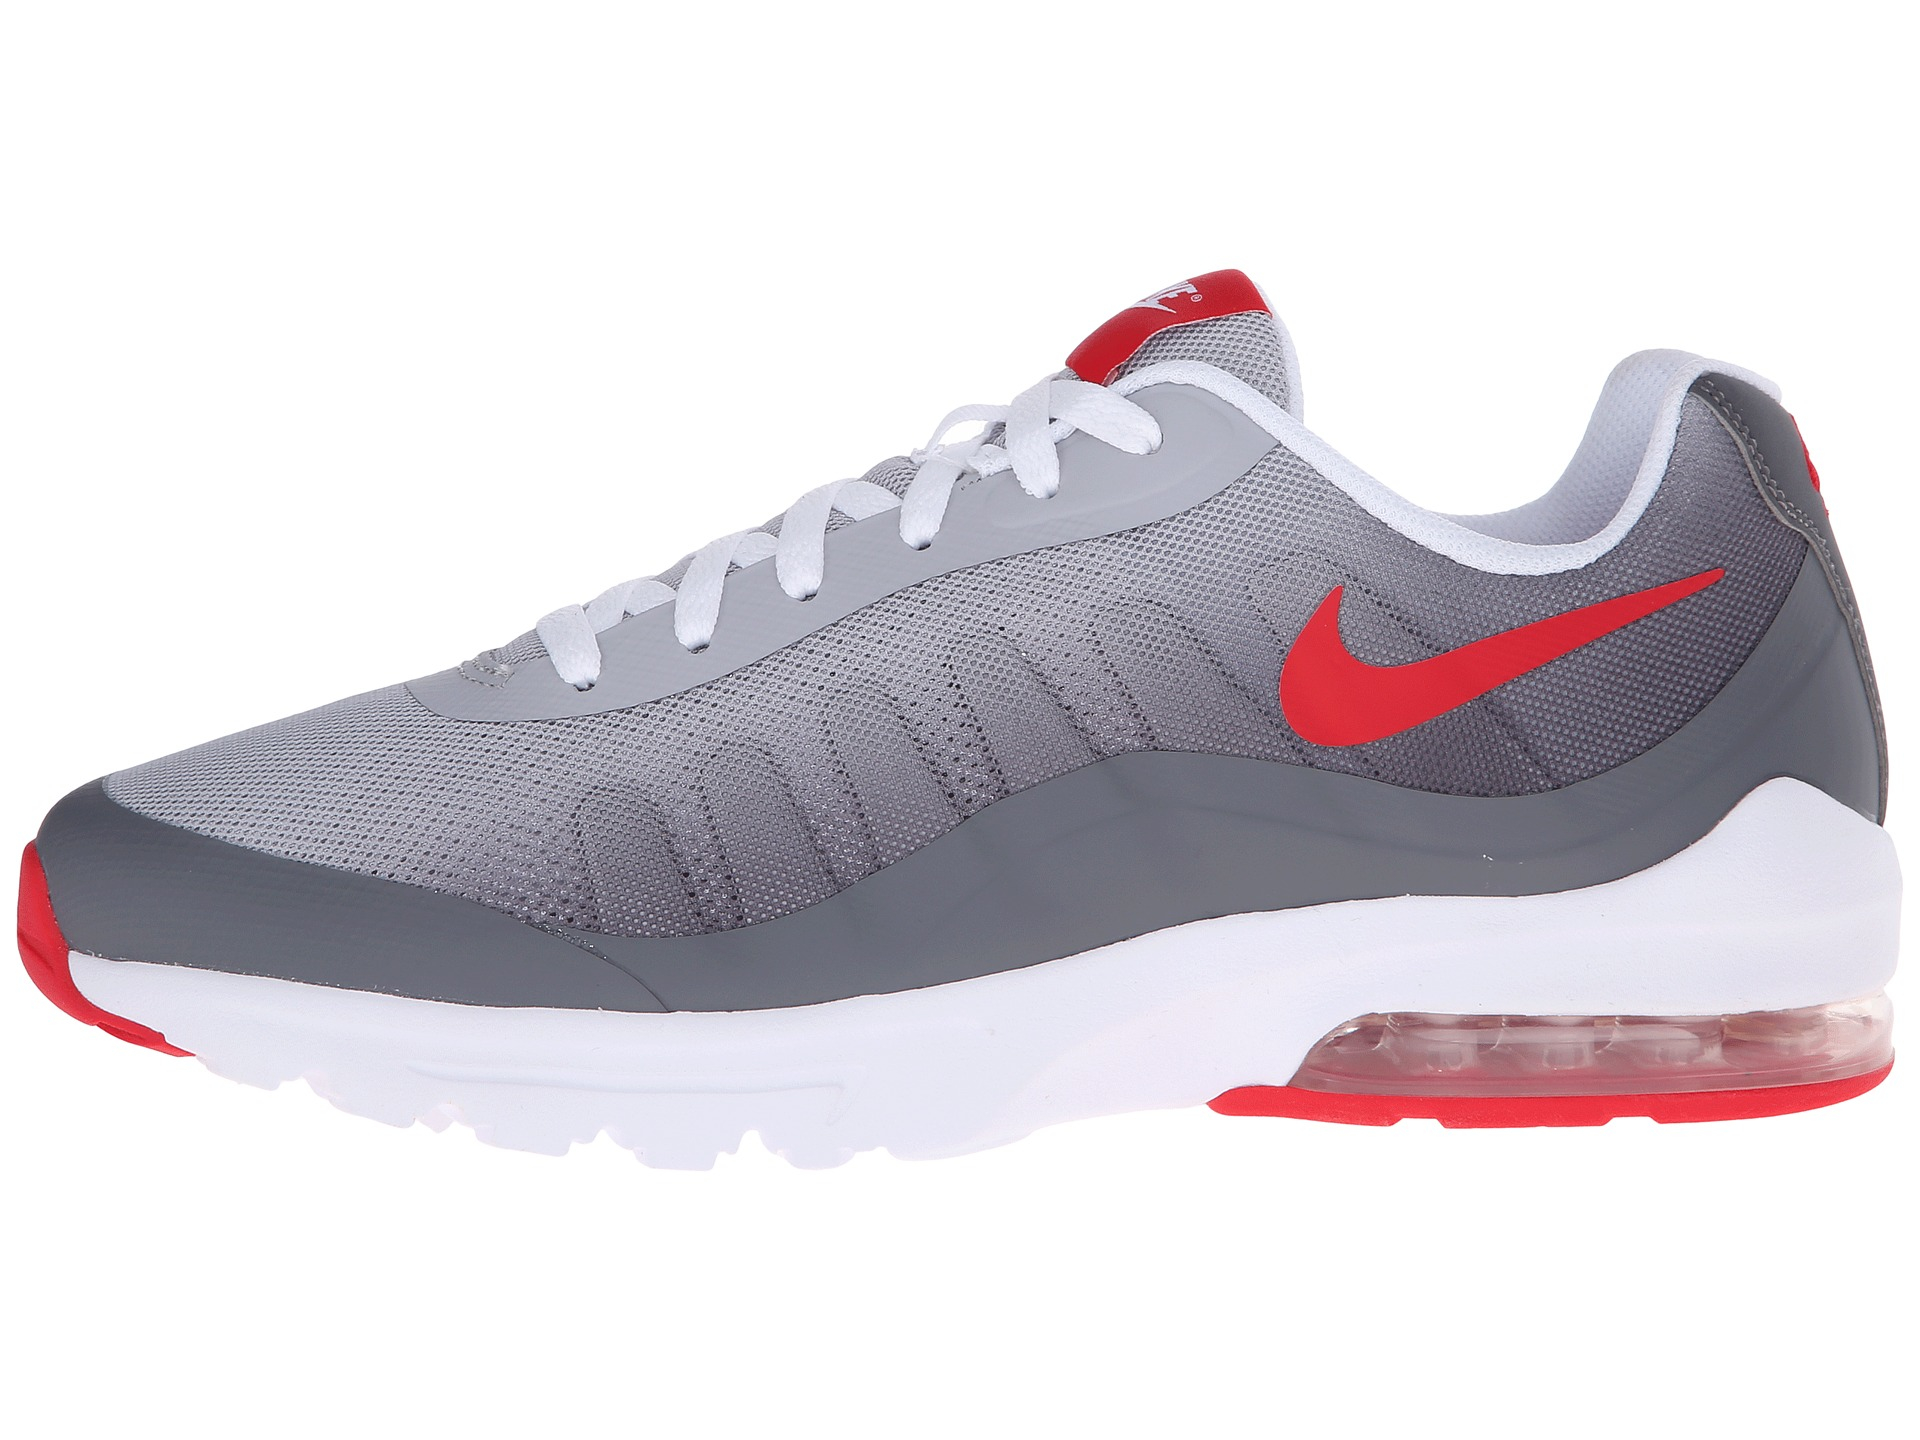 Gemütlich Nike Air Max Invigor Sneaker Männer Rot | Nike